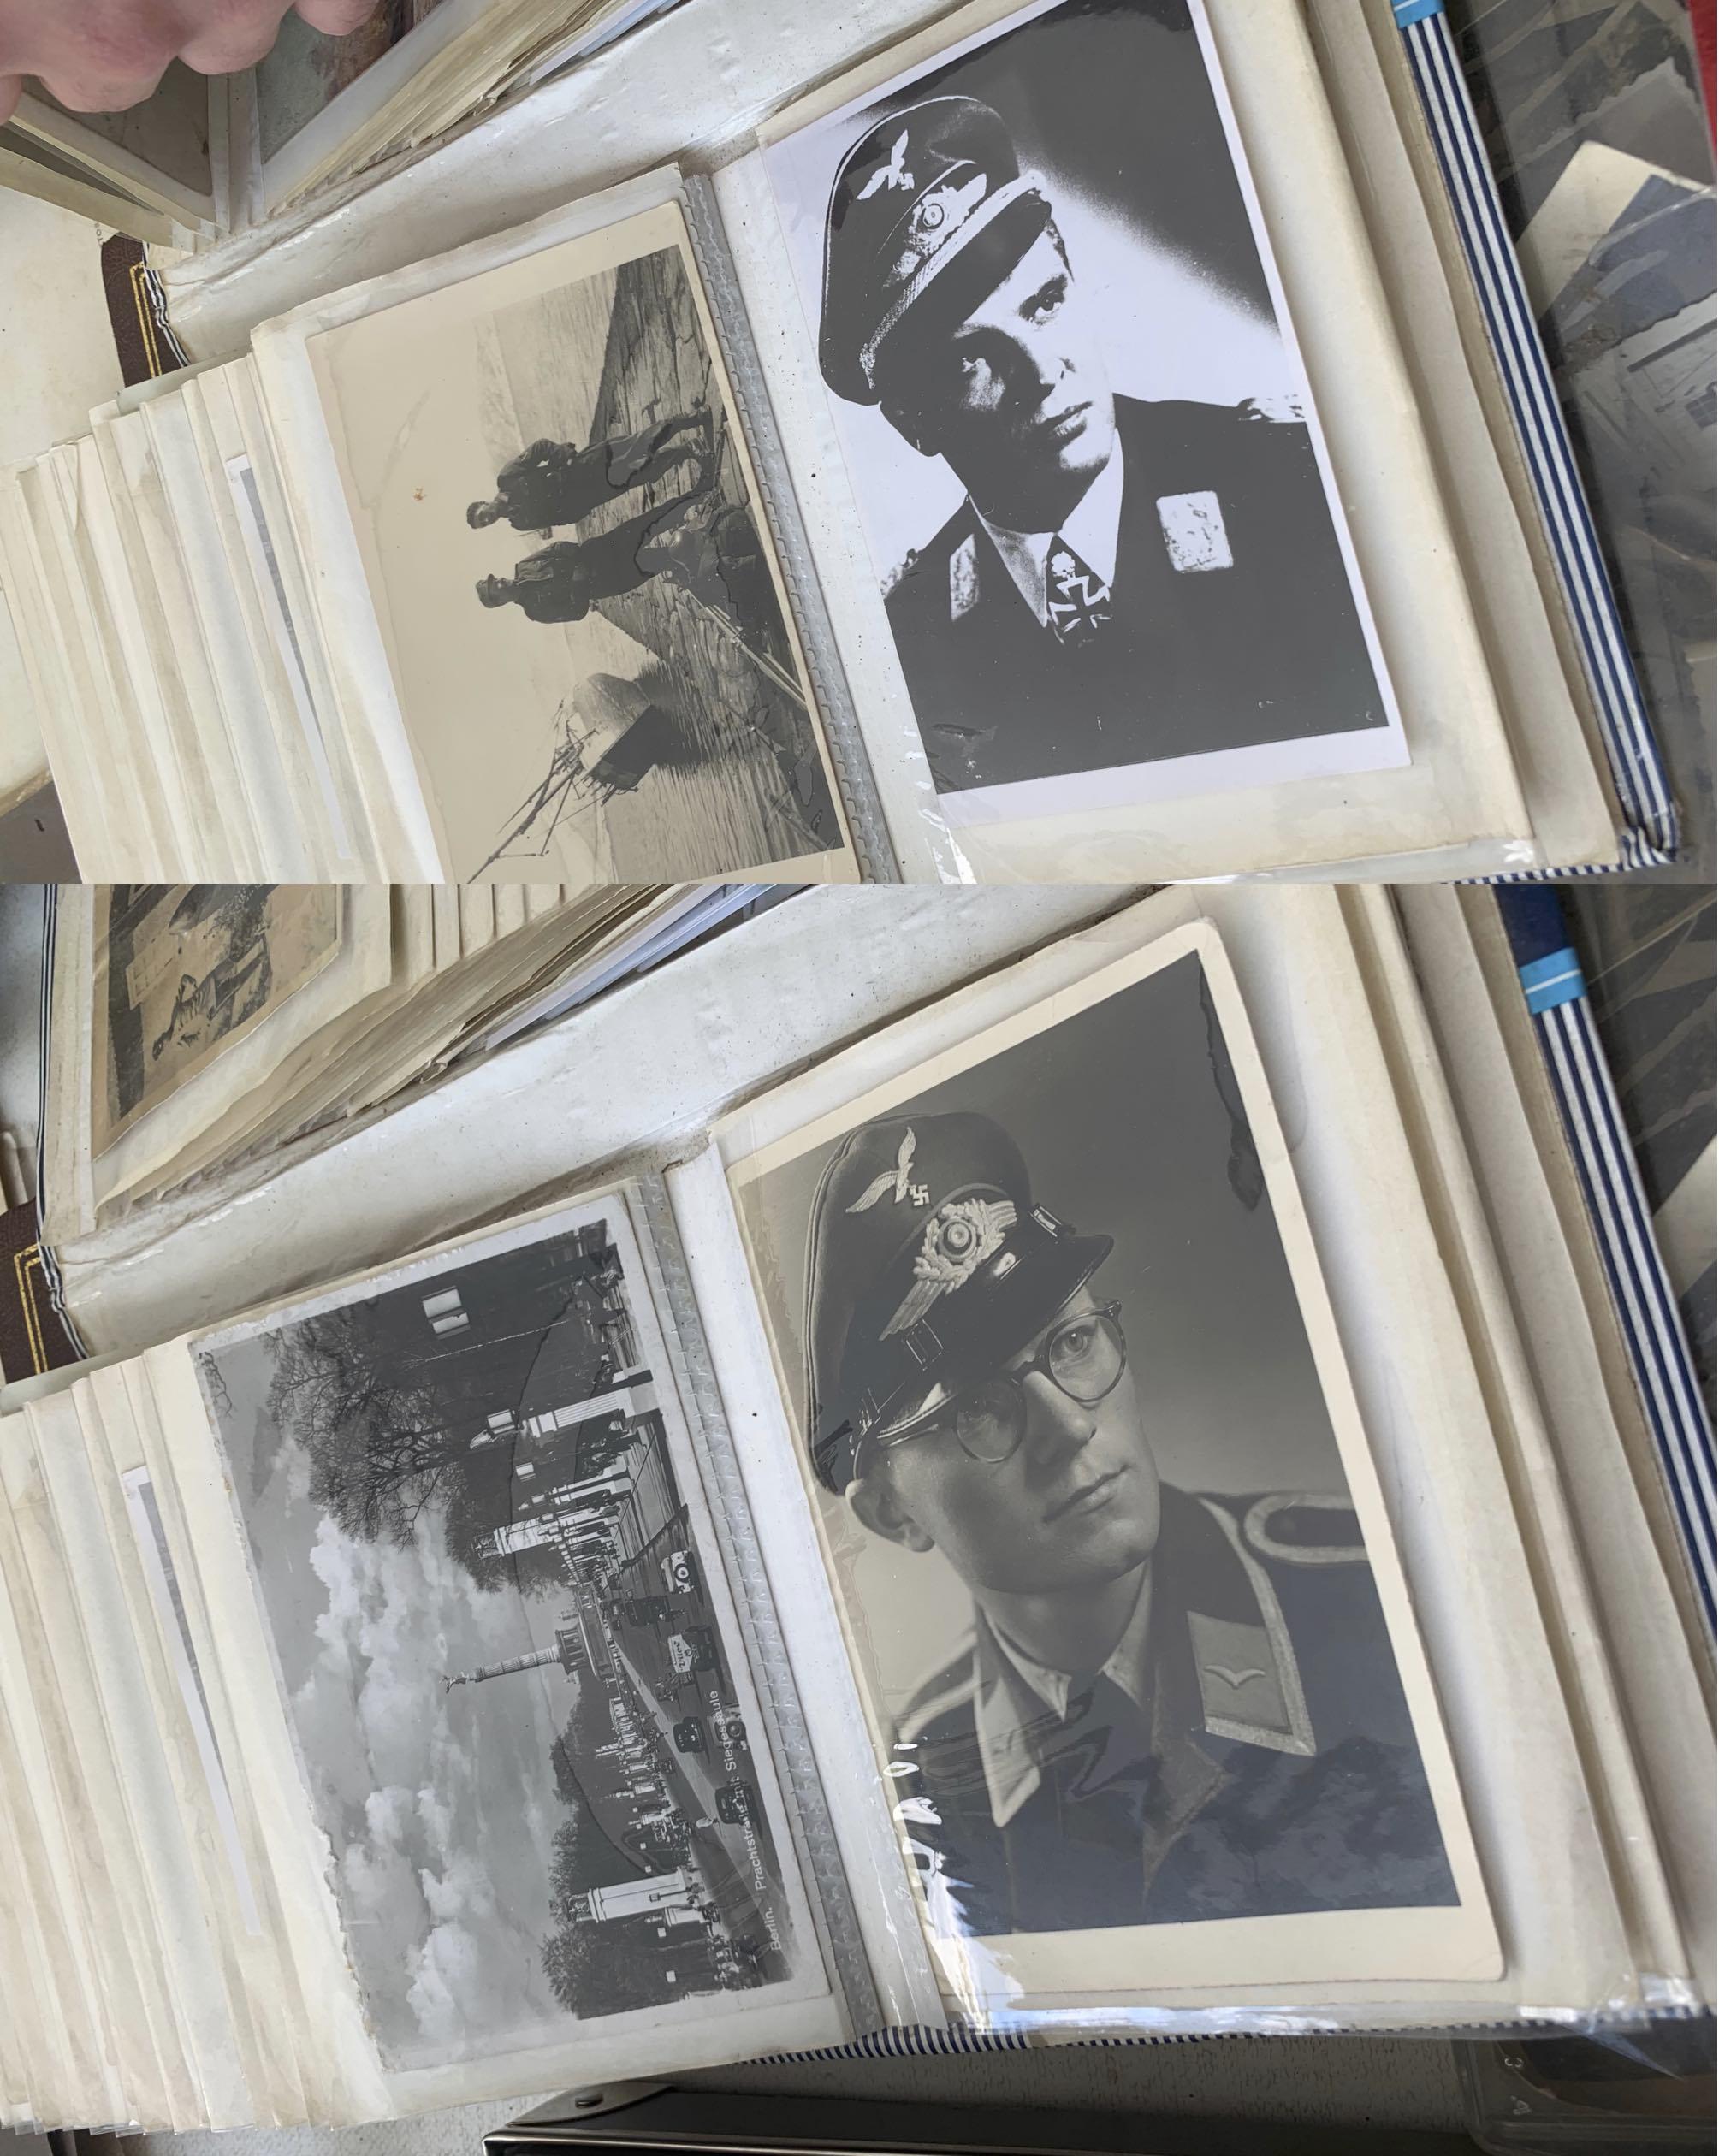 Fotoalben mit NS-Uniformen – inkl. Hakenkreuz (© SdR)